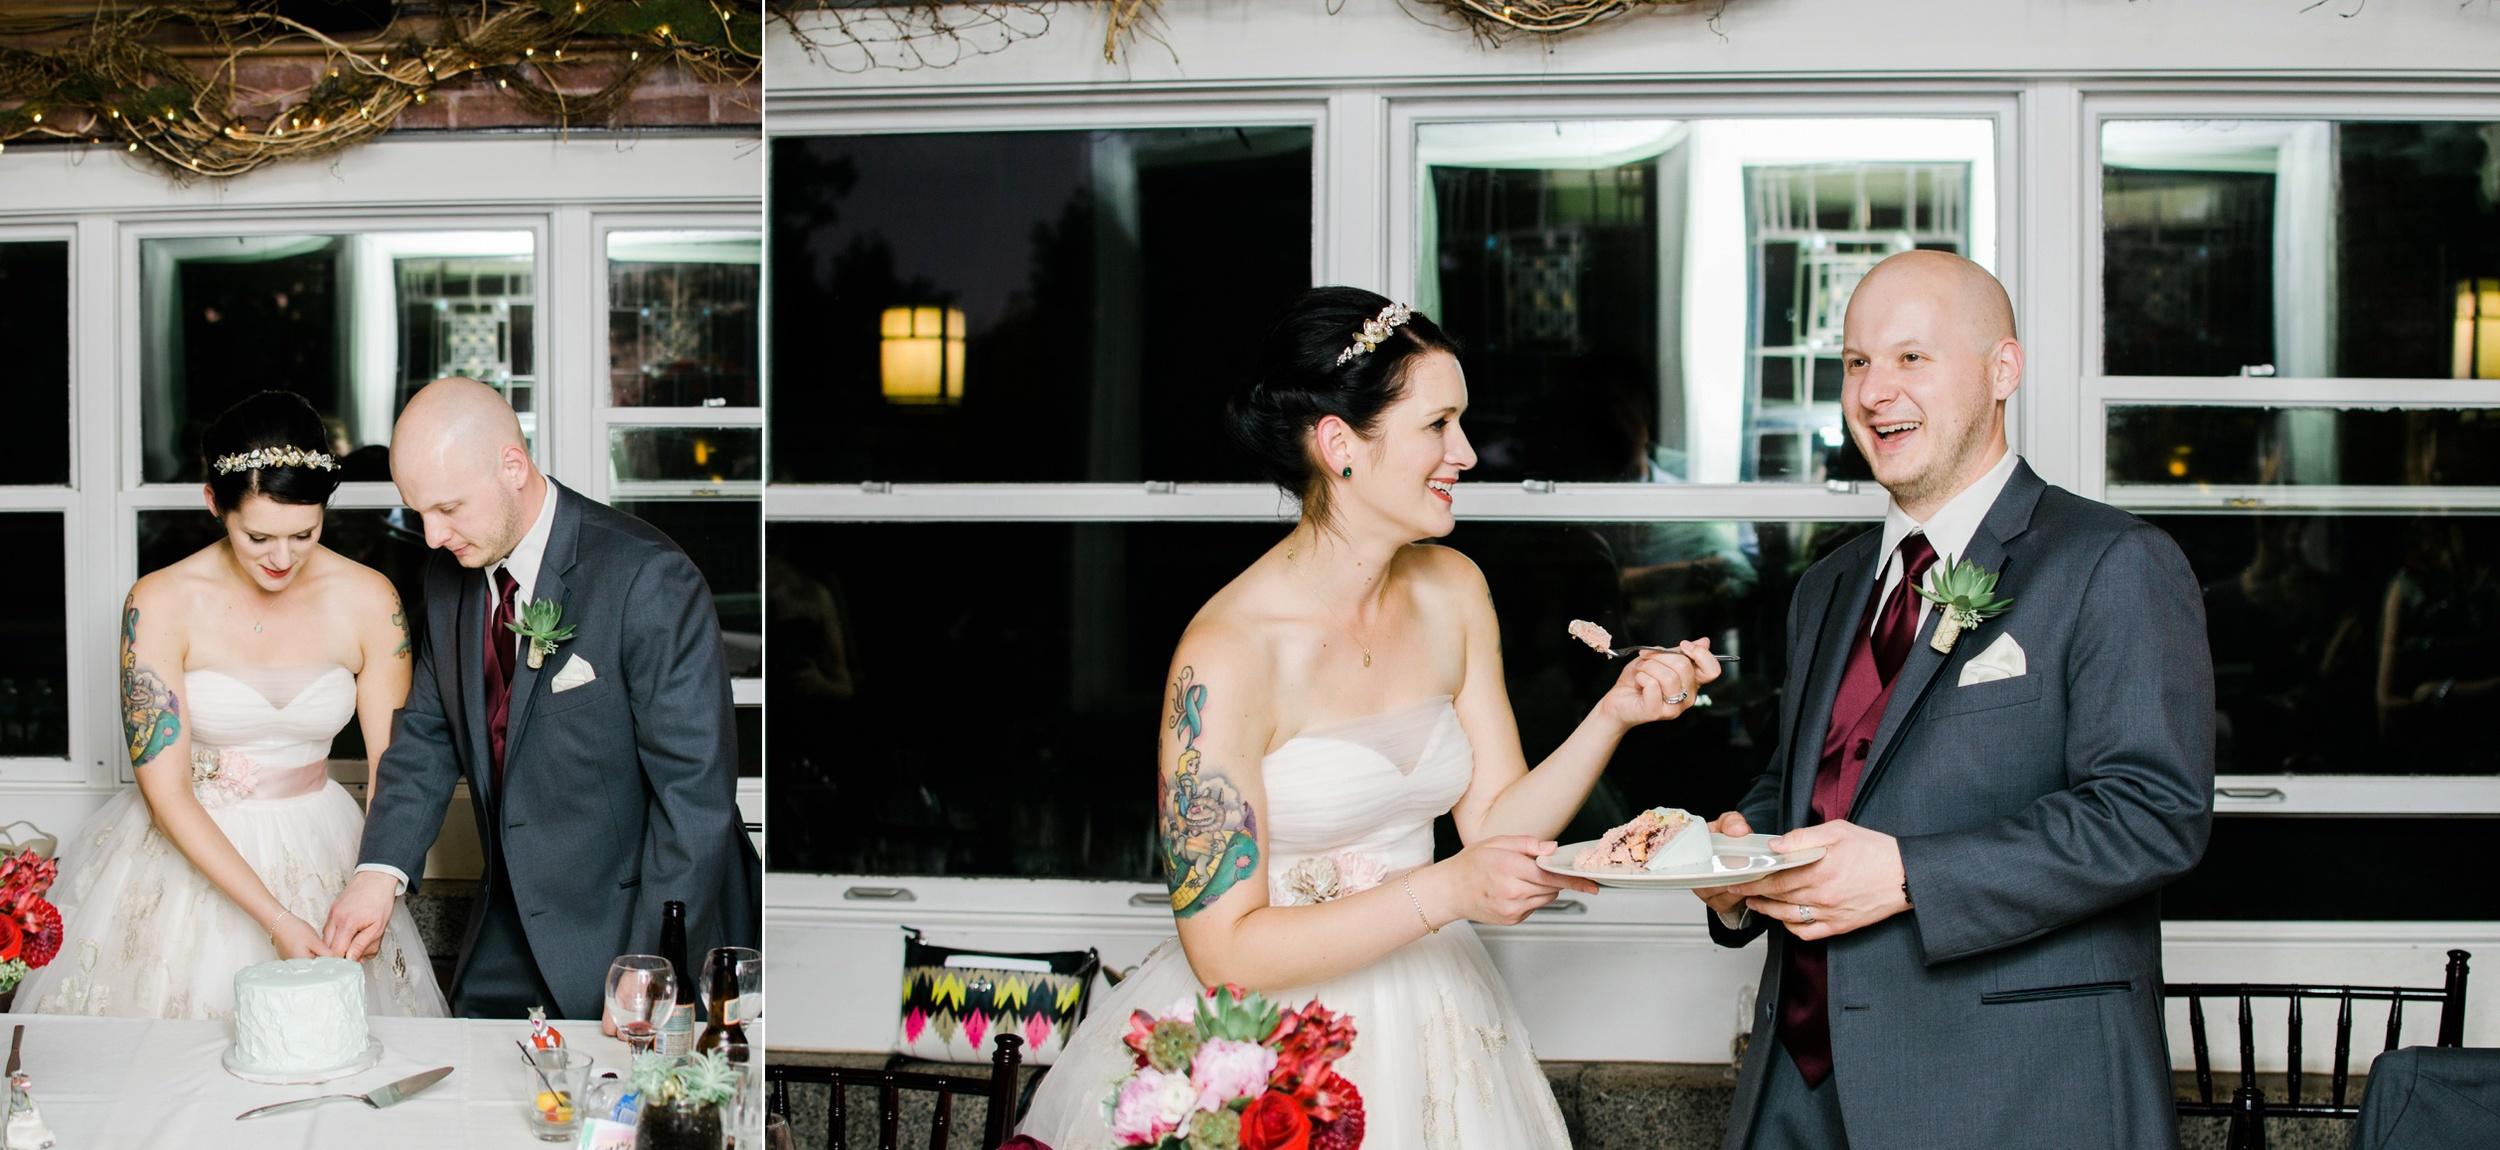 Glensheen Mansion Wedding | Duluth, MN Wedding Photographer_0521.jpg